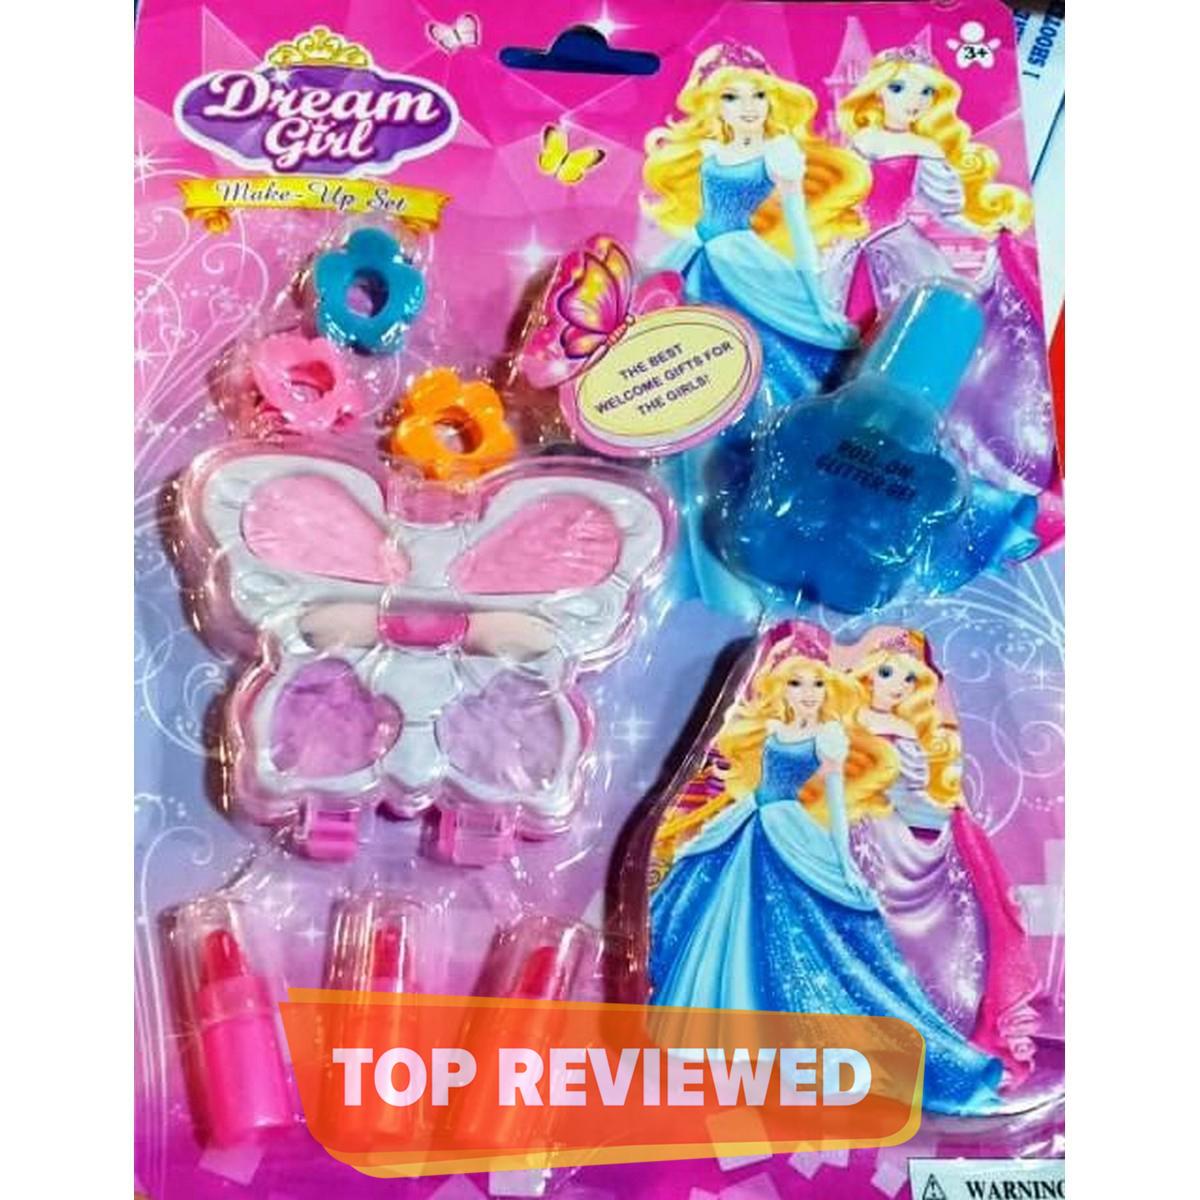 Dream Girl Makeup Decoration Set - 8 Pcs Pack, doll accessories diy